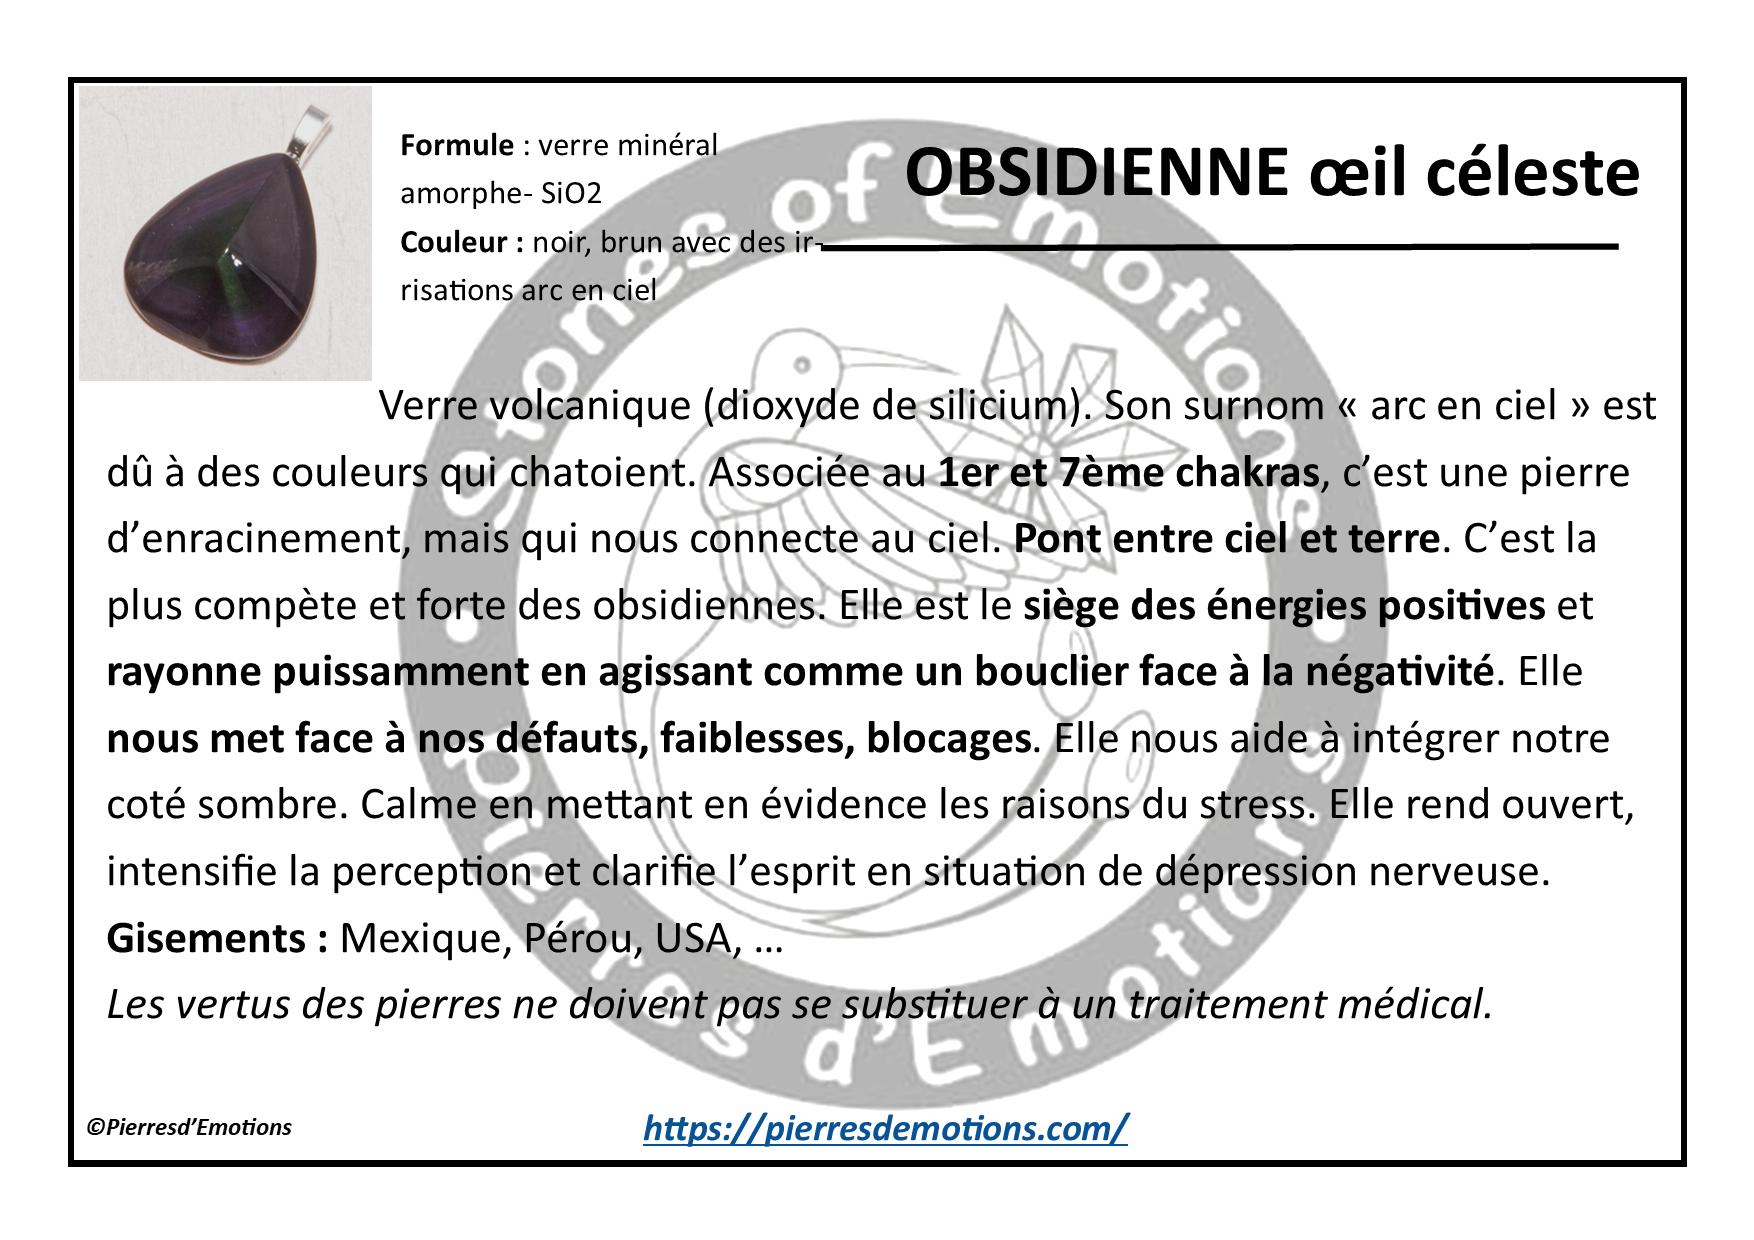 ObsidienneOeilCeleste